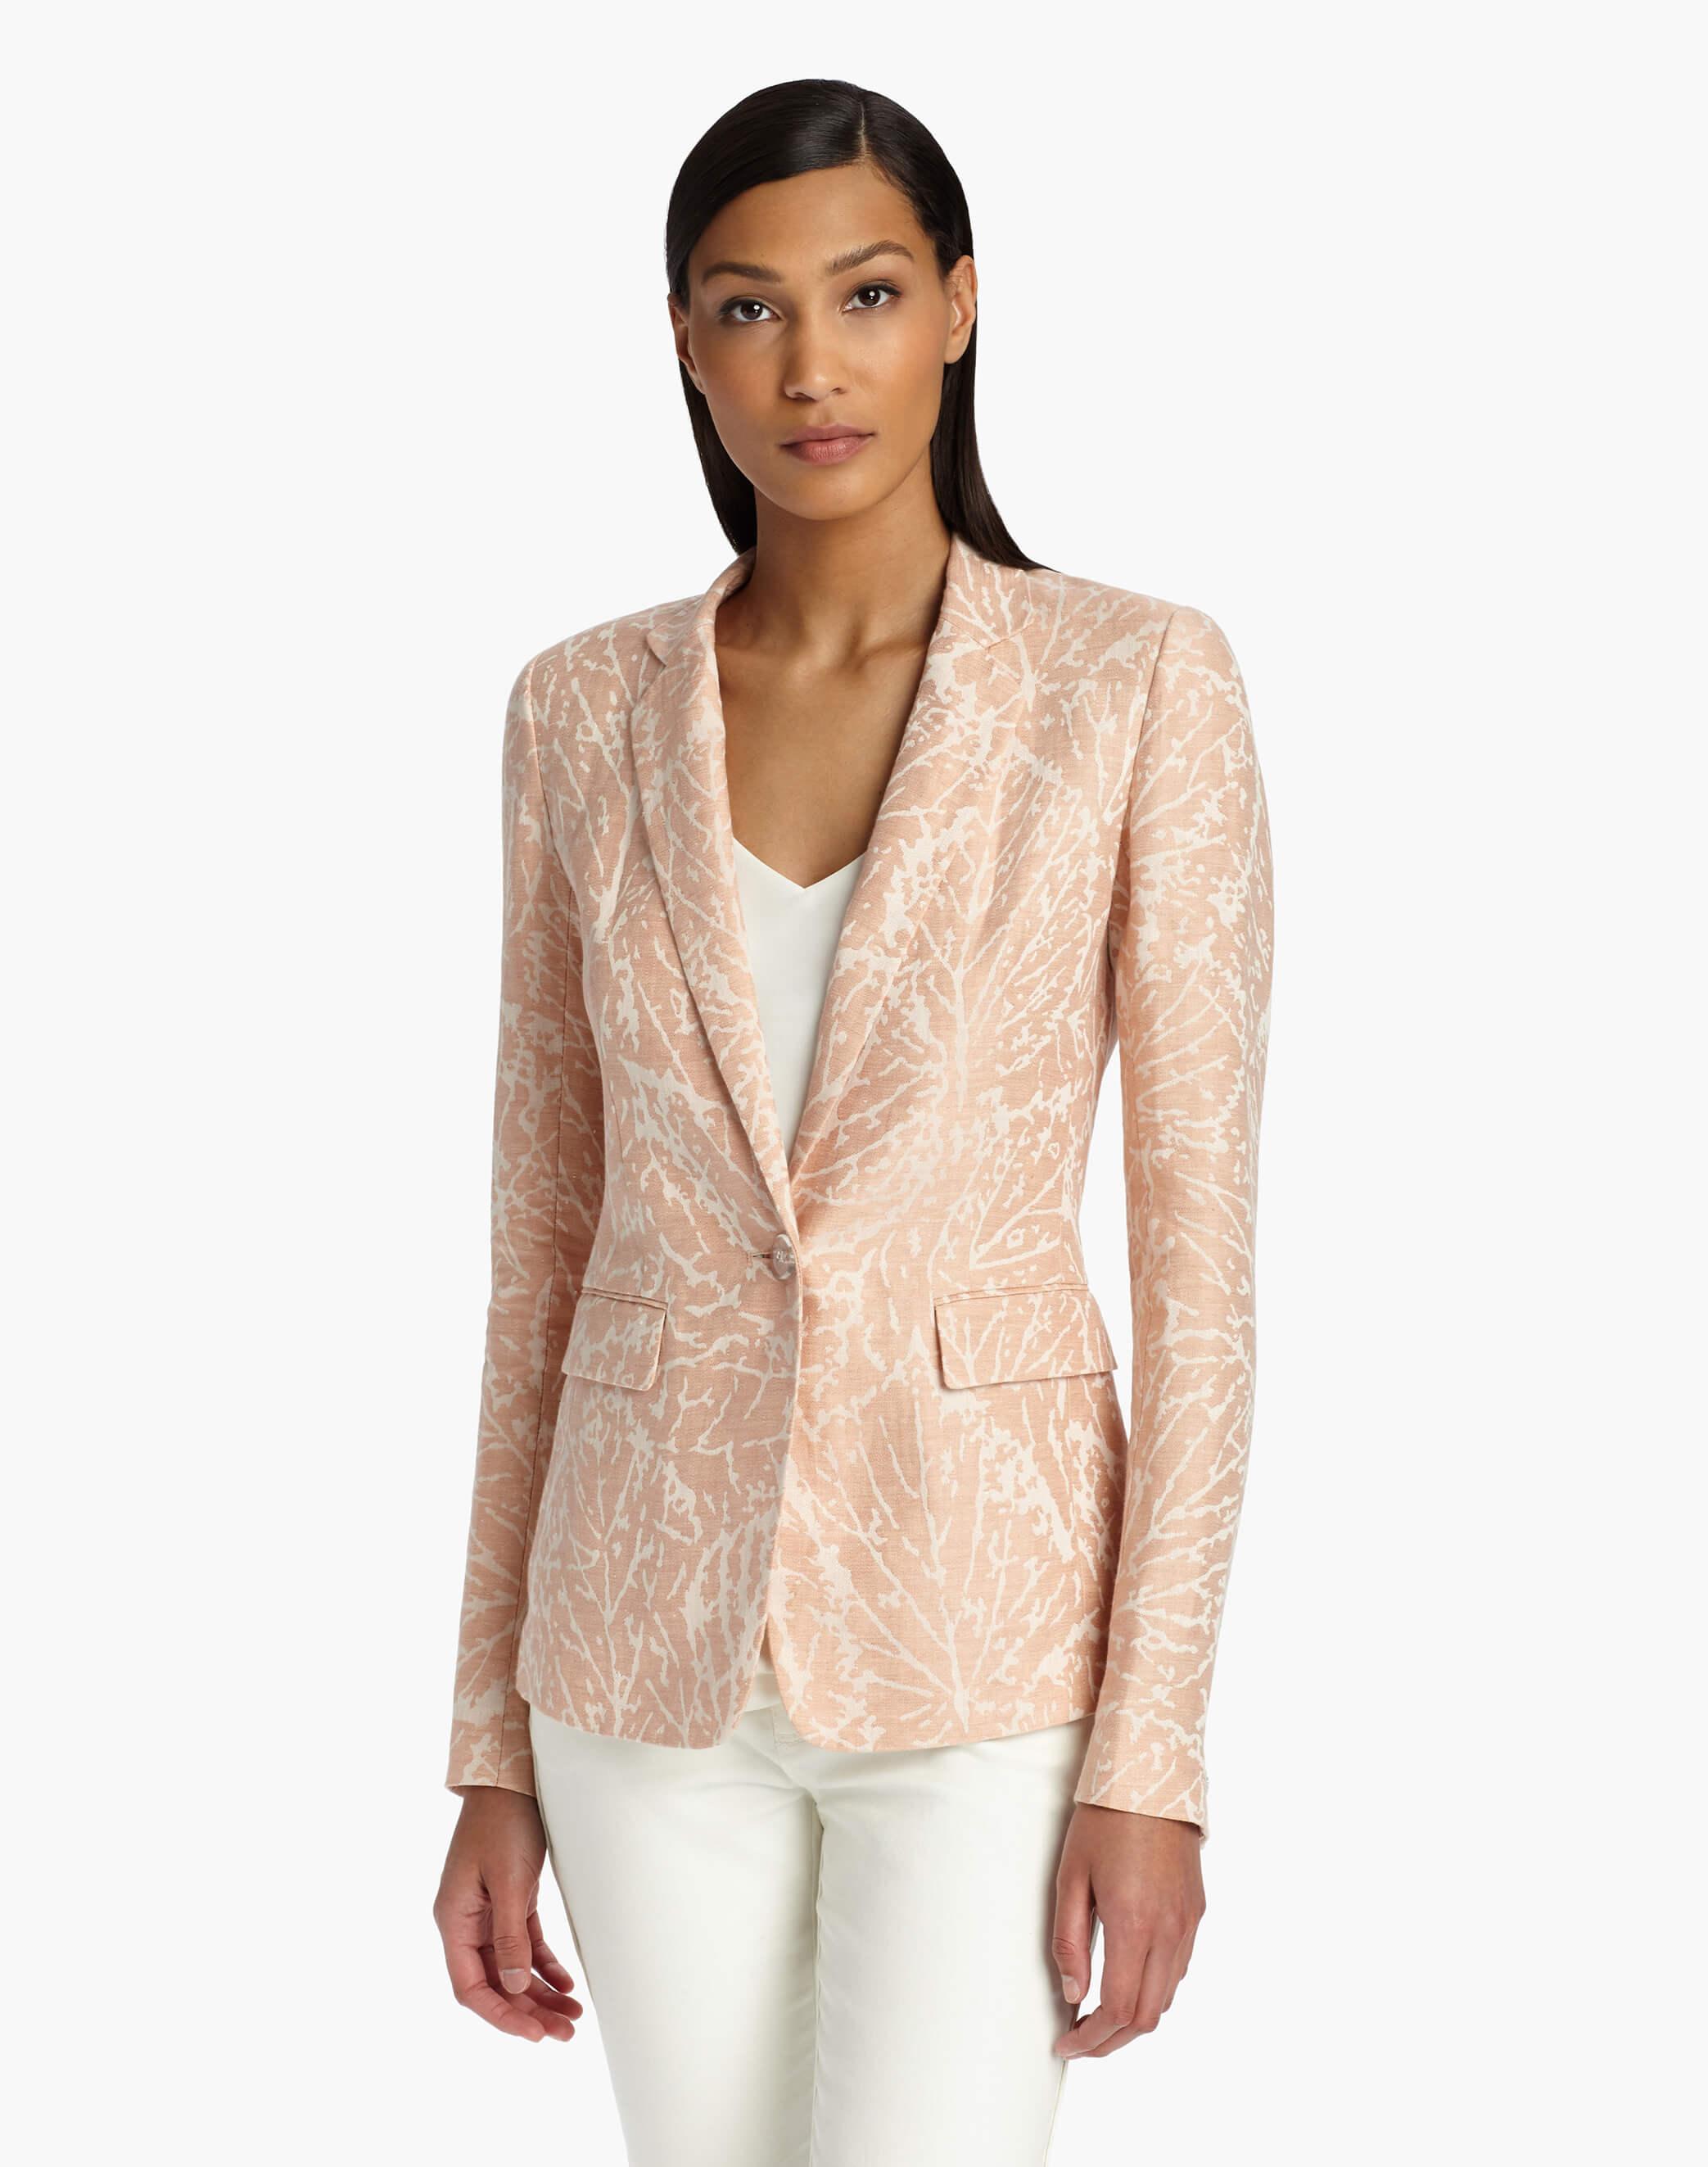 Lafayette 148 NY Linen Jacket